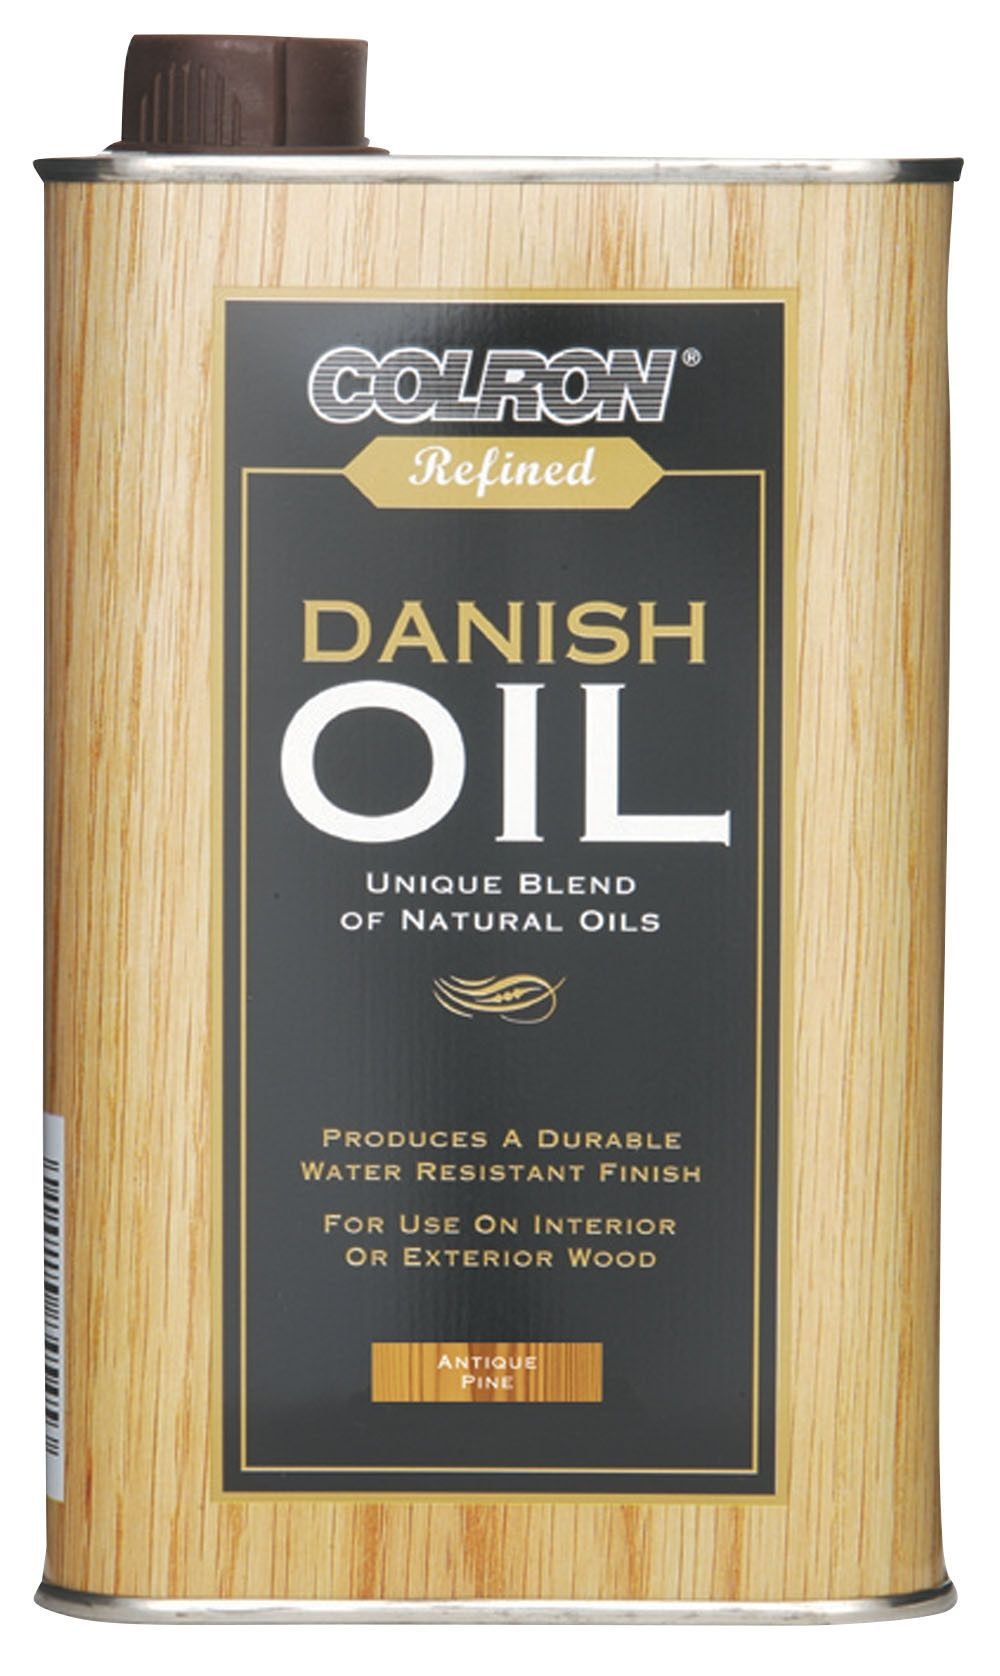 Colron Refined Antique Pine Danish Wood Oil 0 5l Departments Diy At B Q